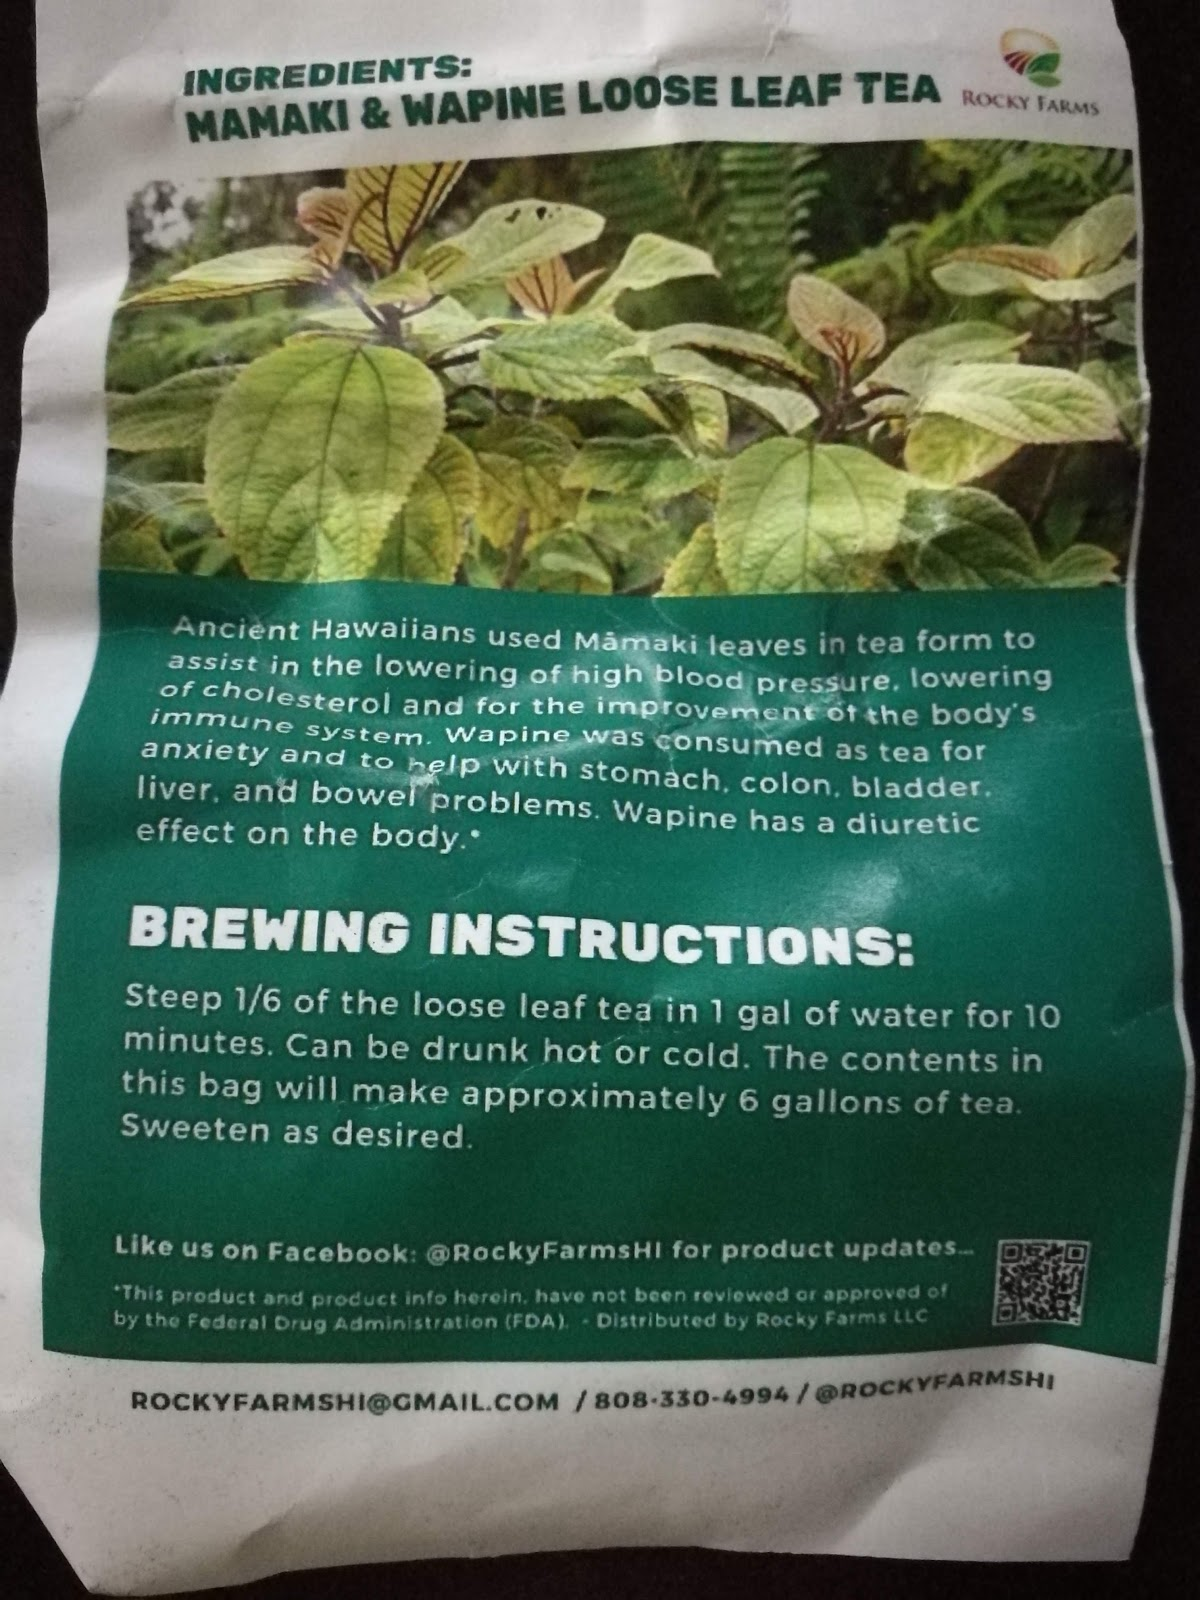 Tea in the ancient world: Hawaiian tisane blend: Mamaki and Wapine herbs